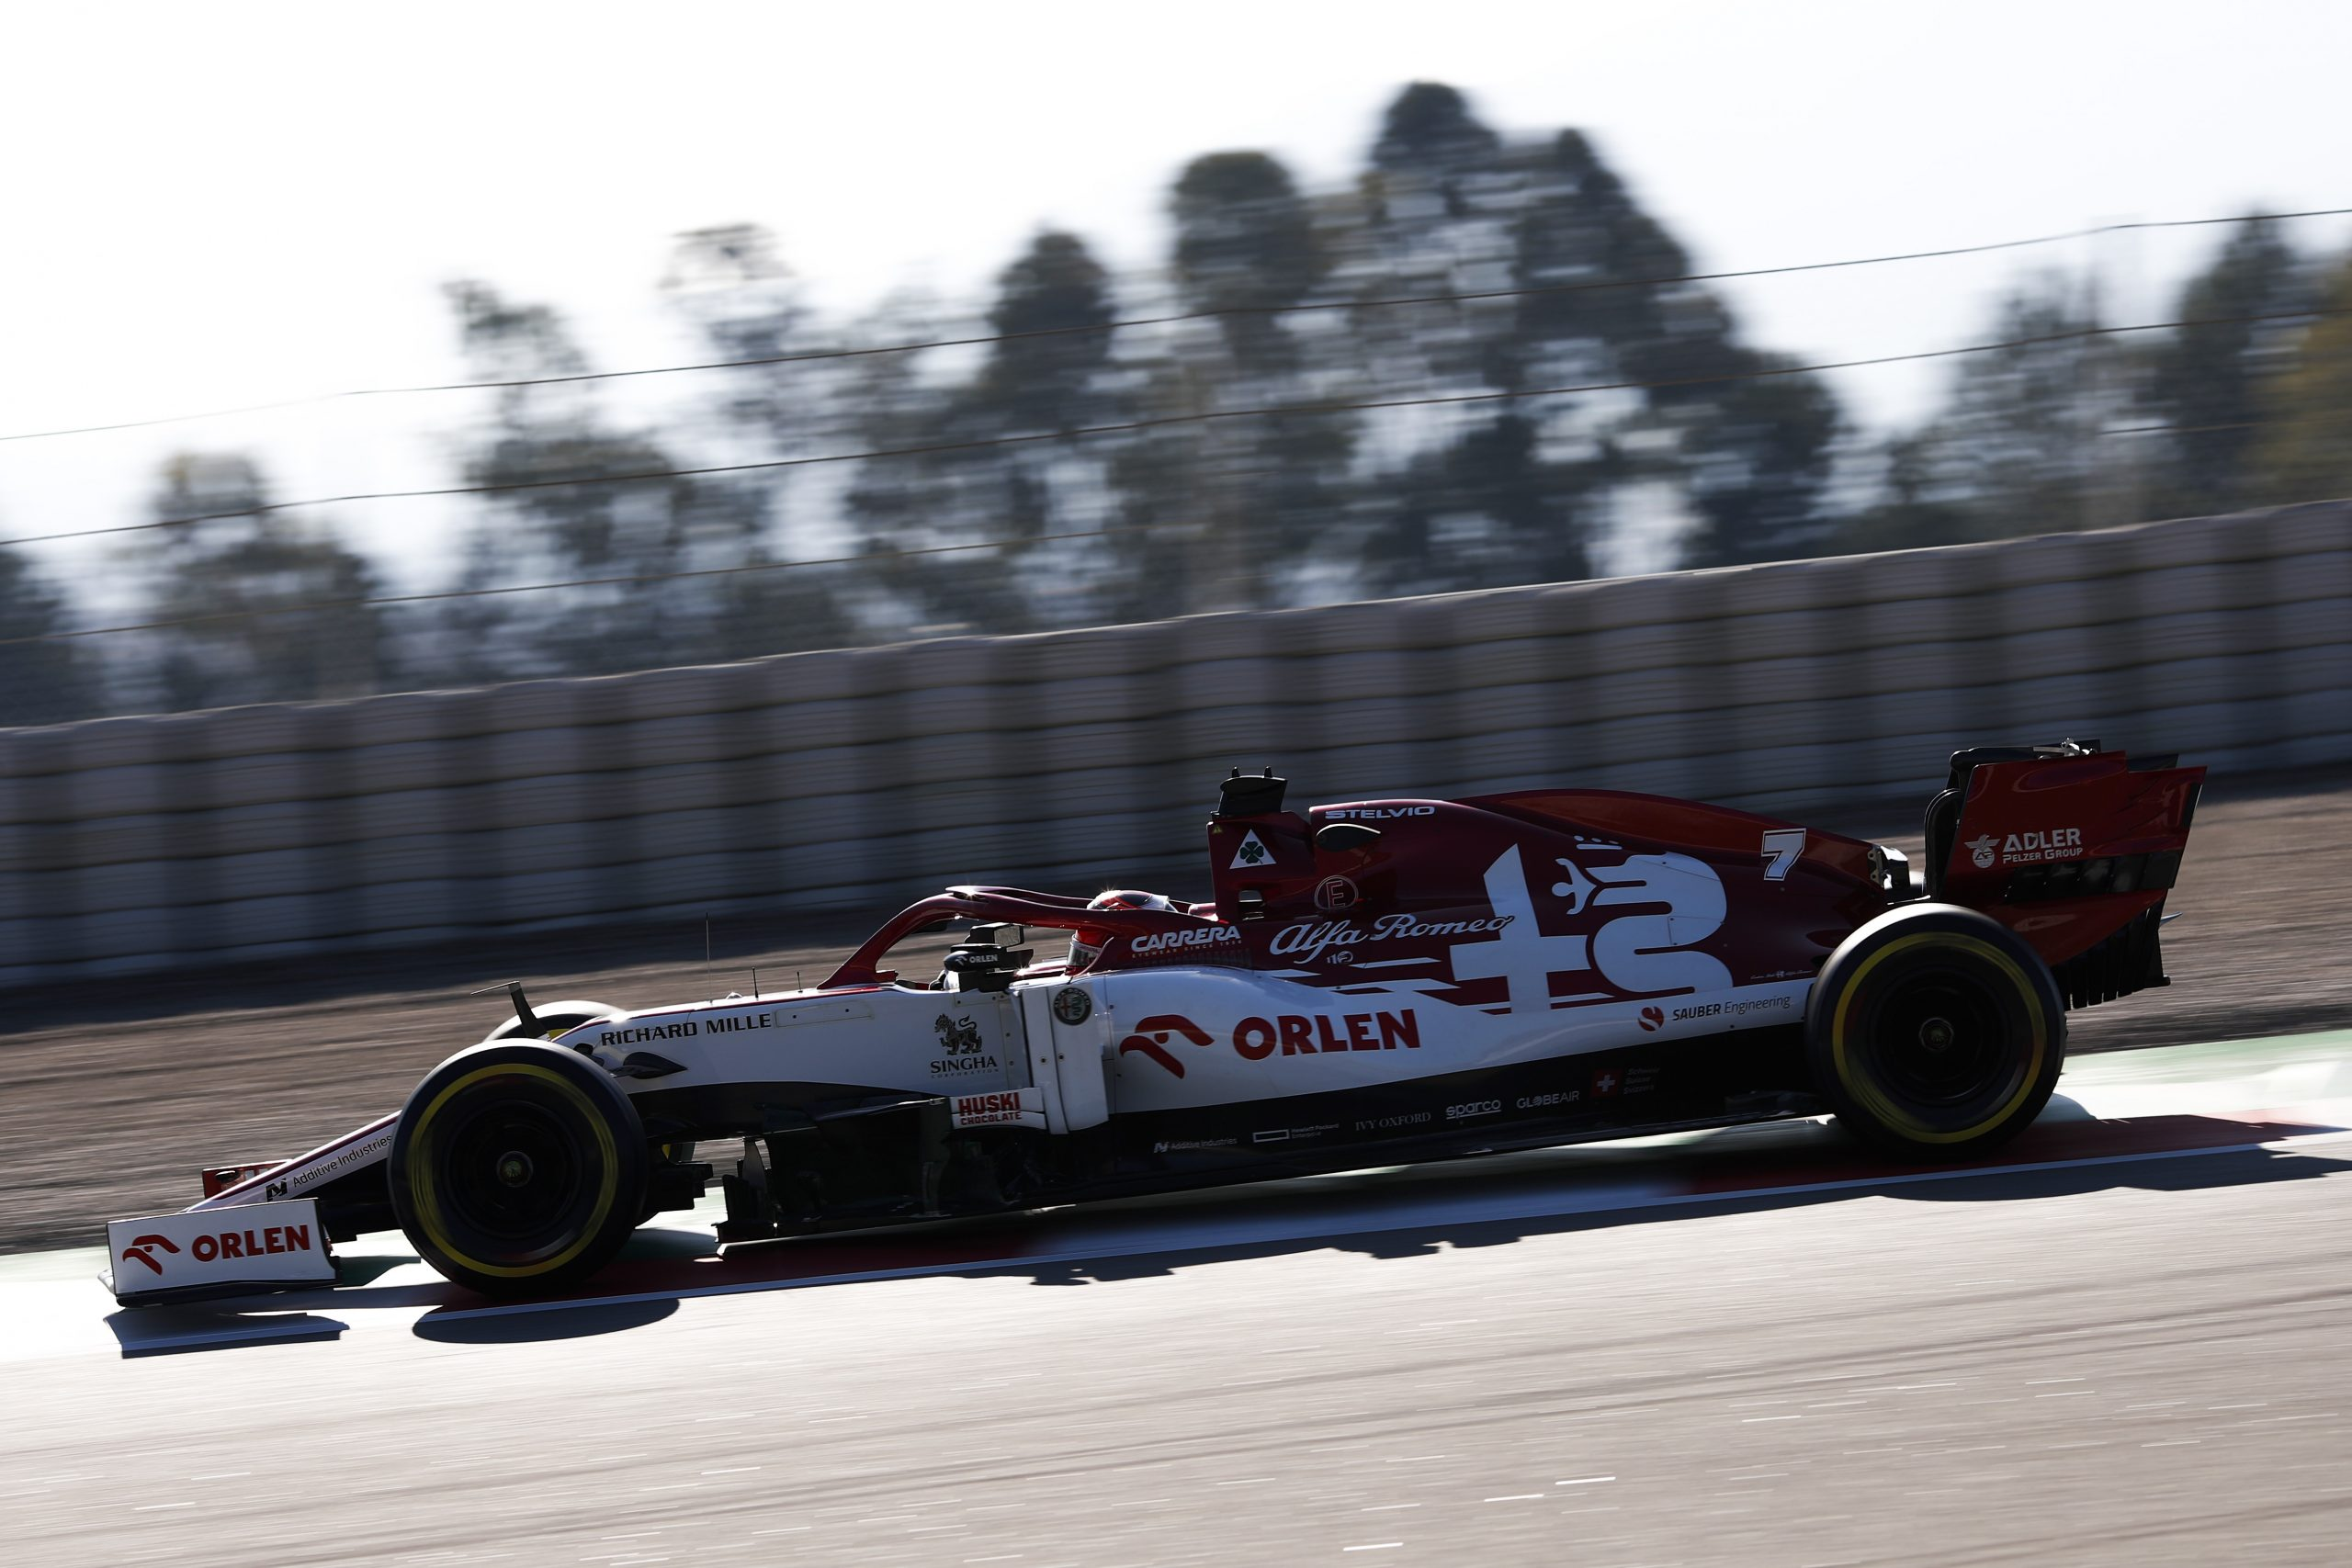 F1 2020 My Own Team Barcelona-t01-thursday21-scaled